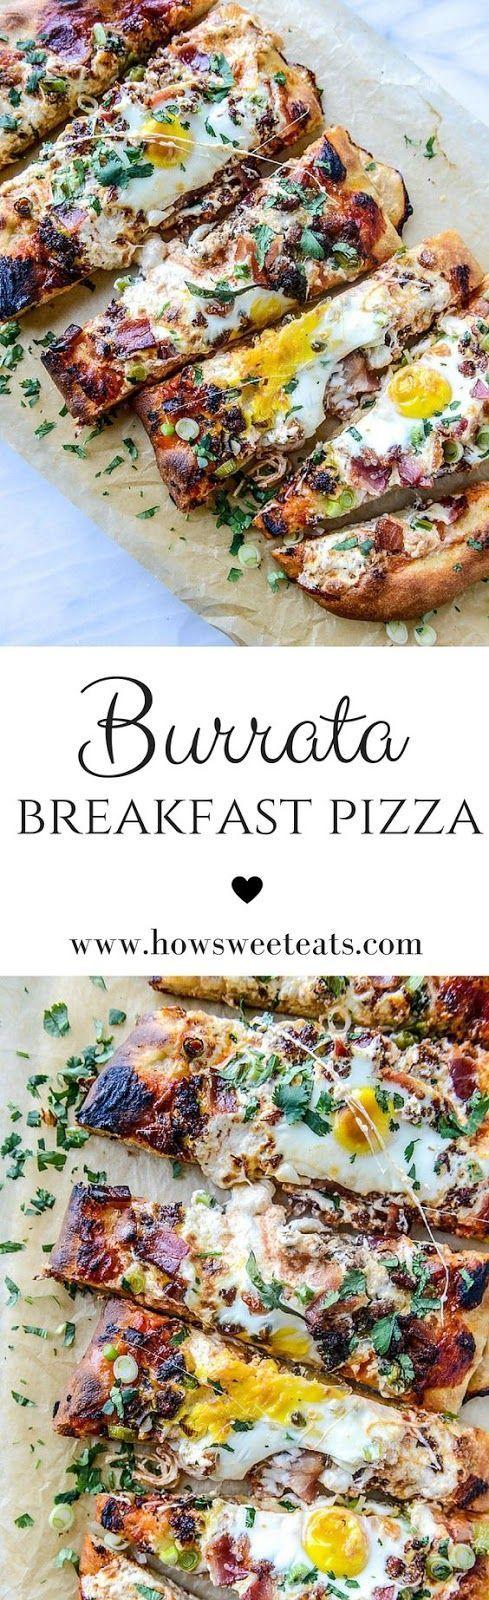 Burrata Breakfast Pizza: